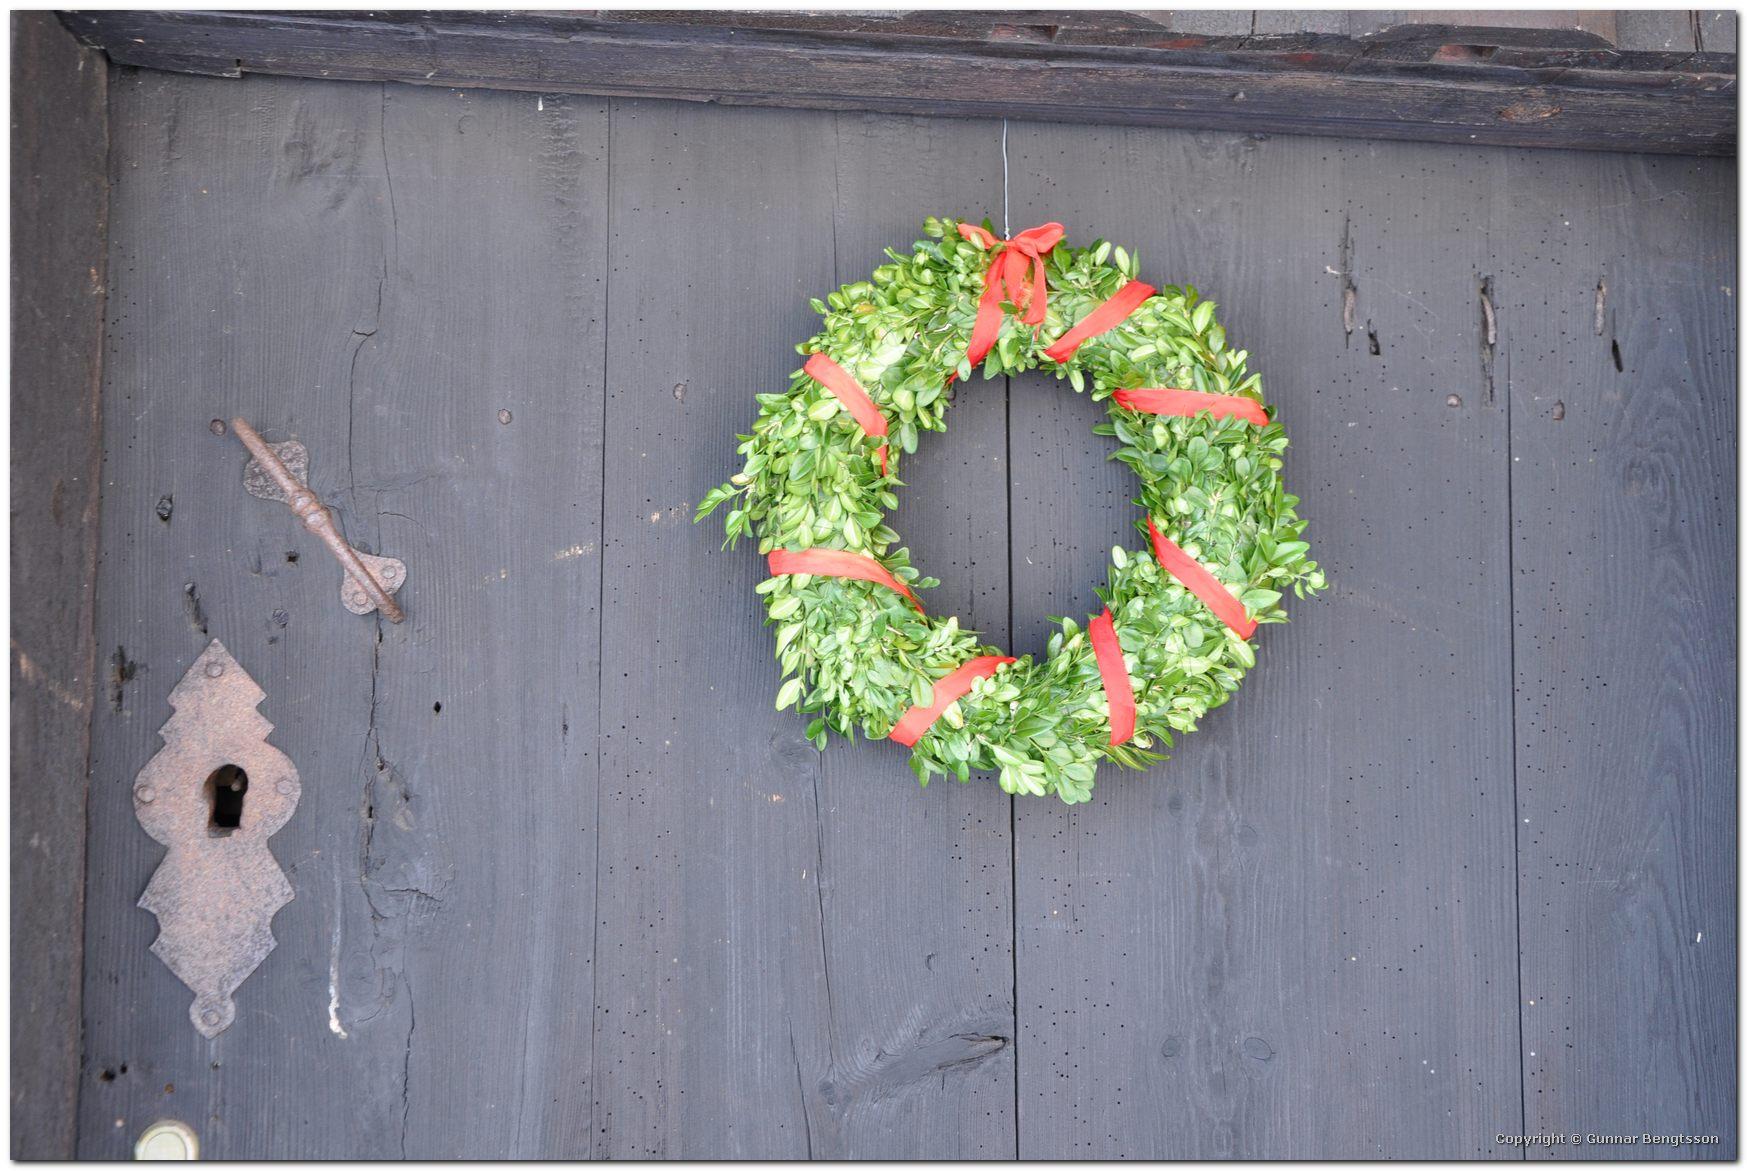 2009-12_harplinge_hembygd_10